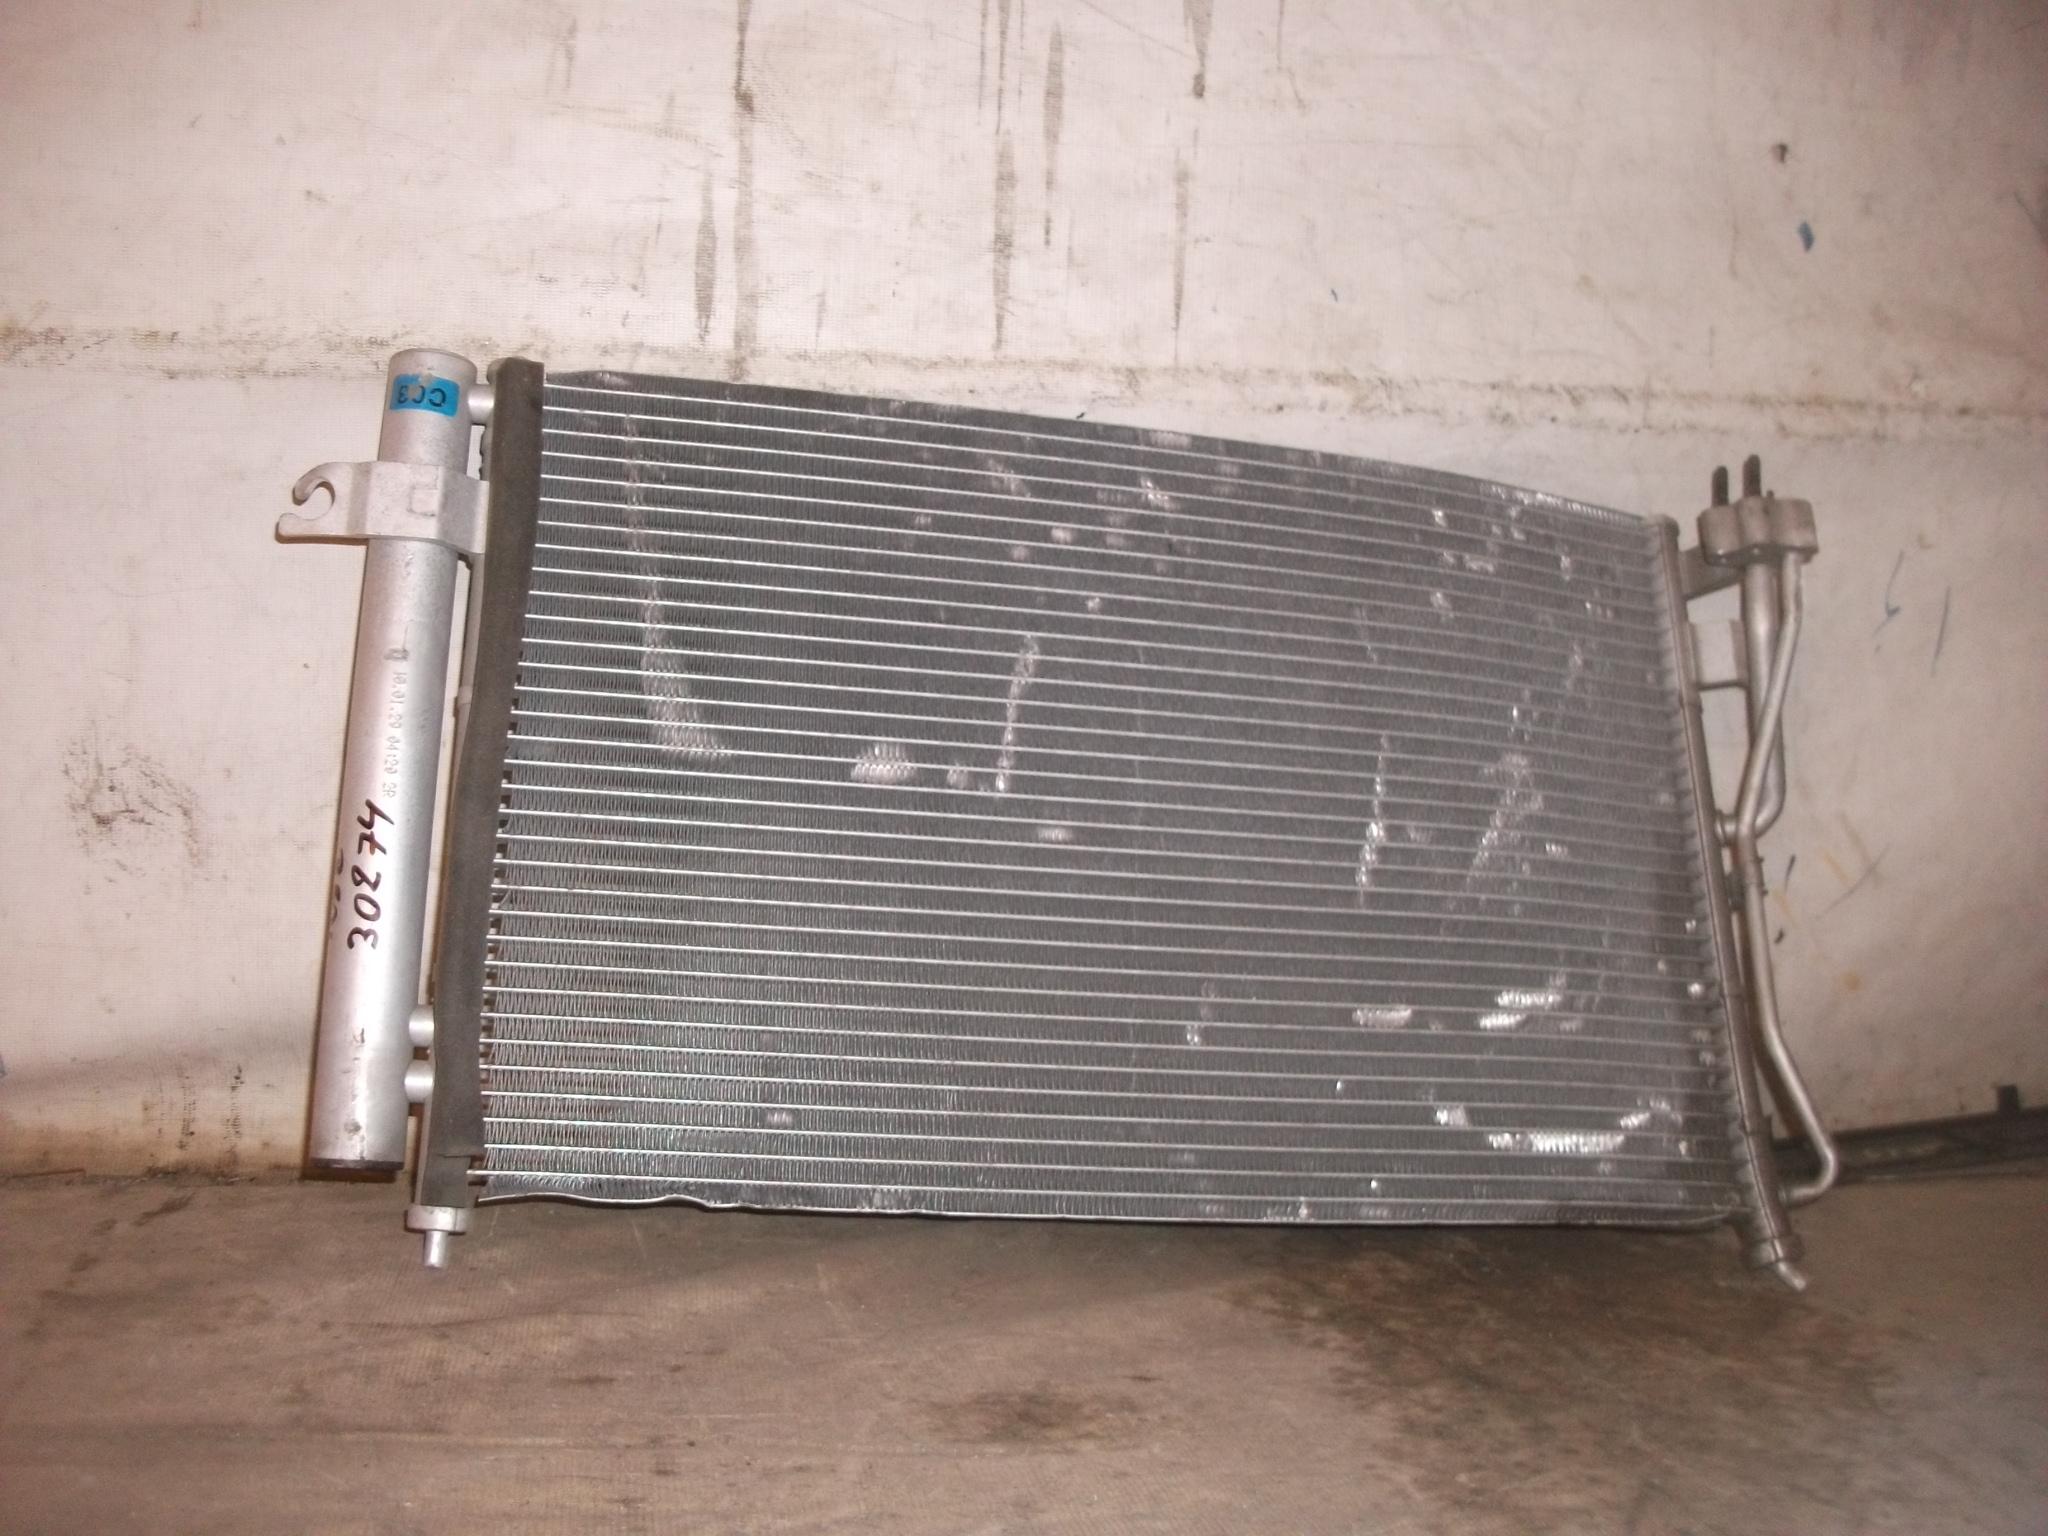 хендай гетц замена радиатора отопителя своими руками